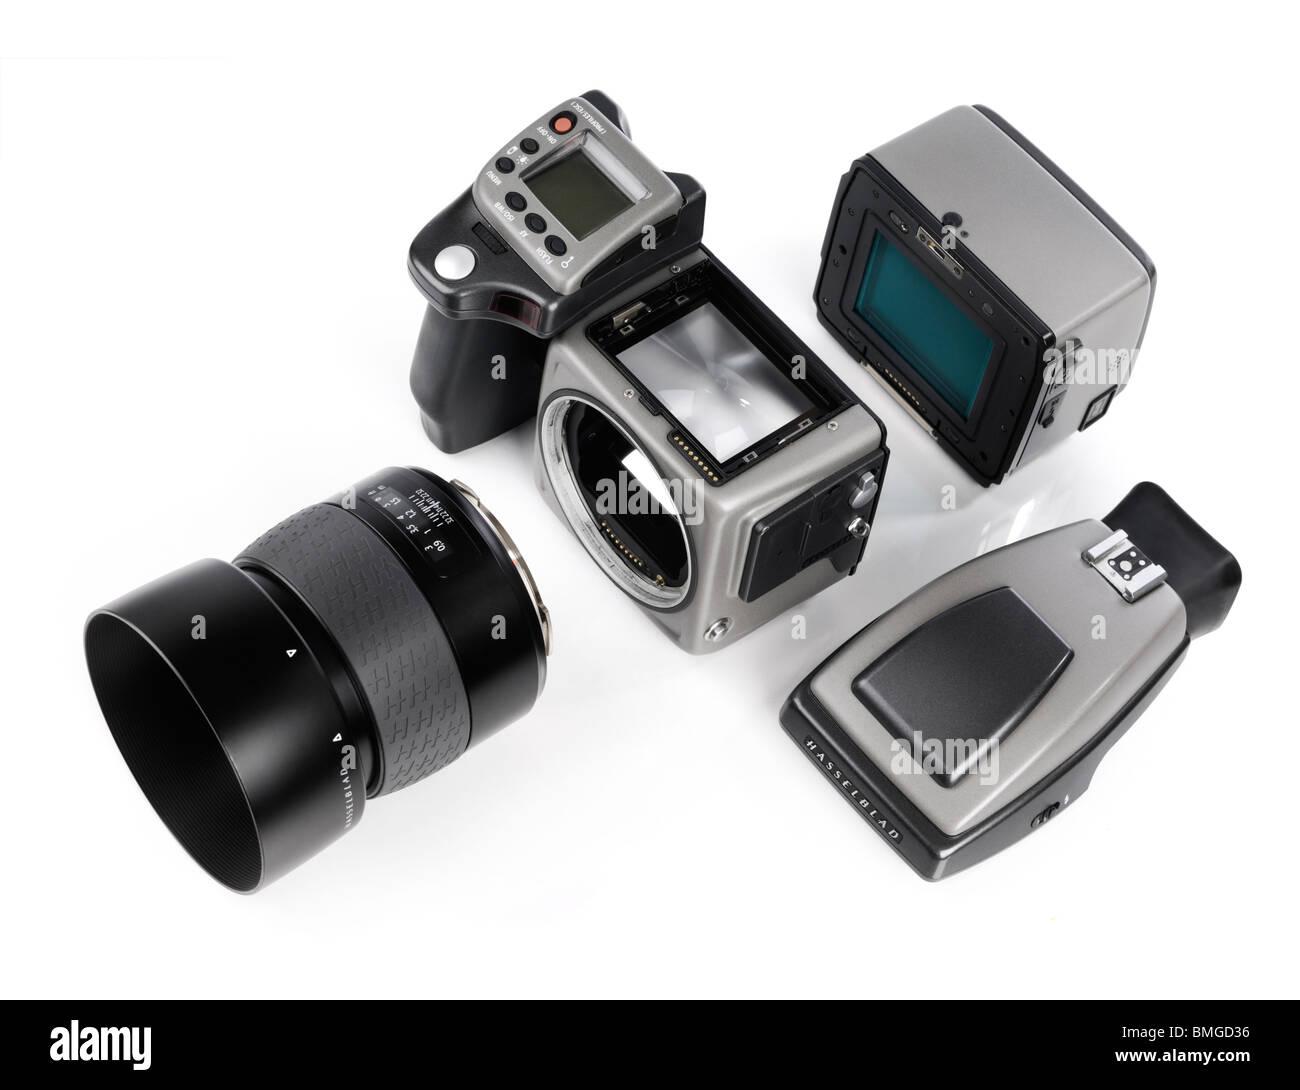 Hasselblad H3DII Camera Body Last